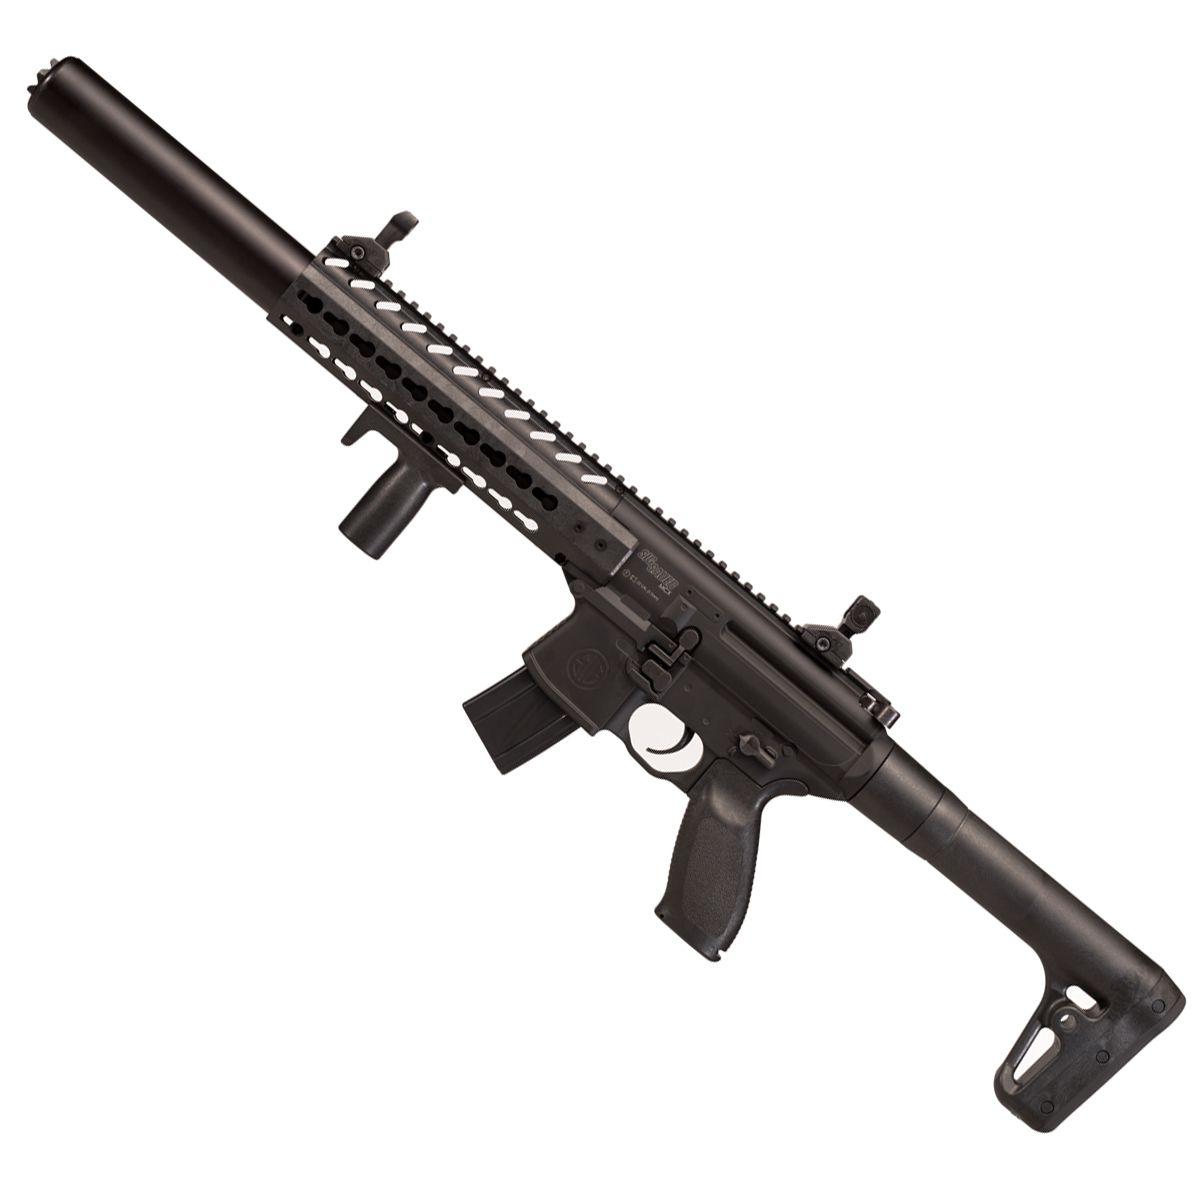 Rifle De Pressão Co2 Sig Sauer Mcx Asp Cal.4,5mm Fullmetal